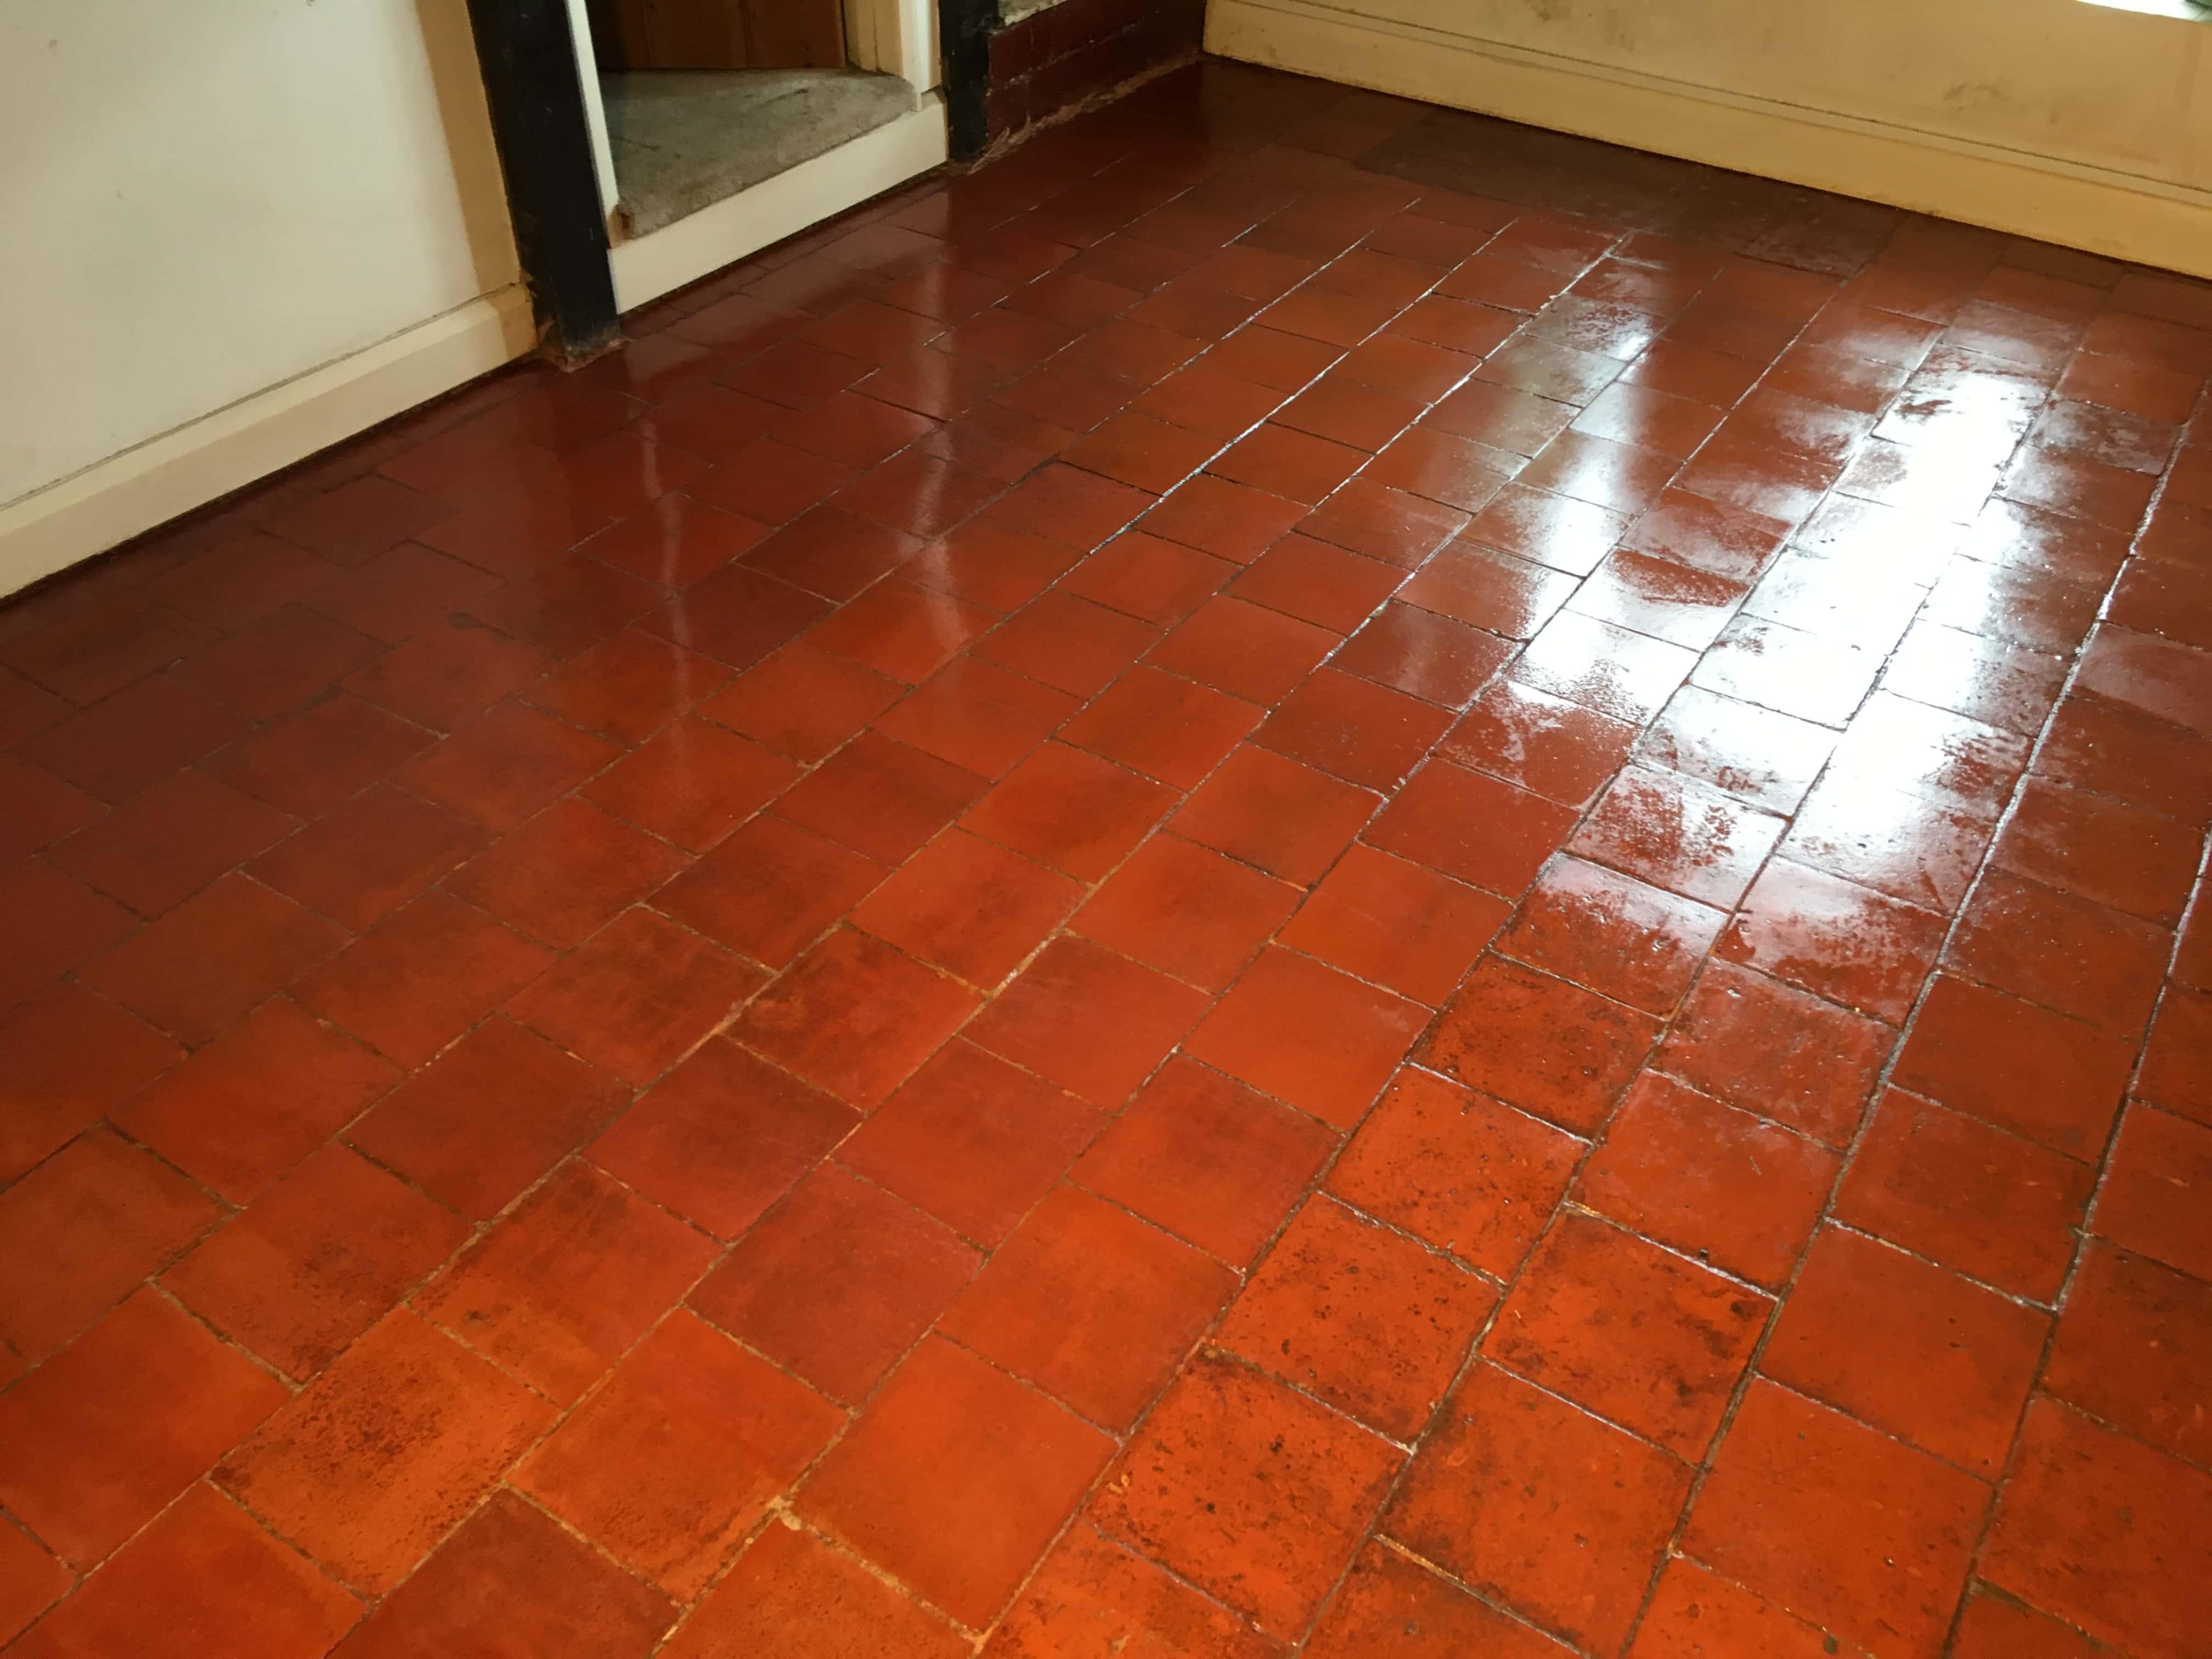 Terracotta Tiled Floor After Restoration Leatherhead